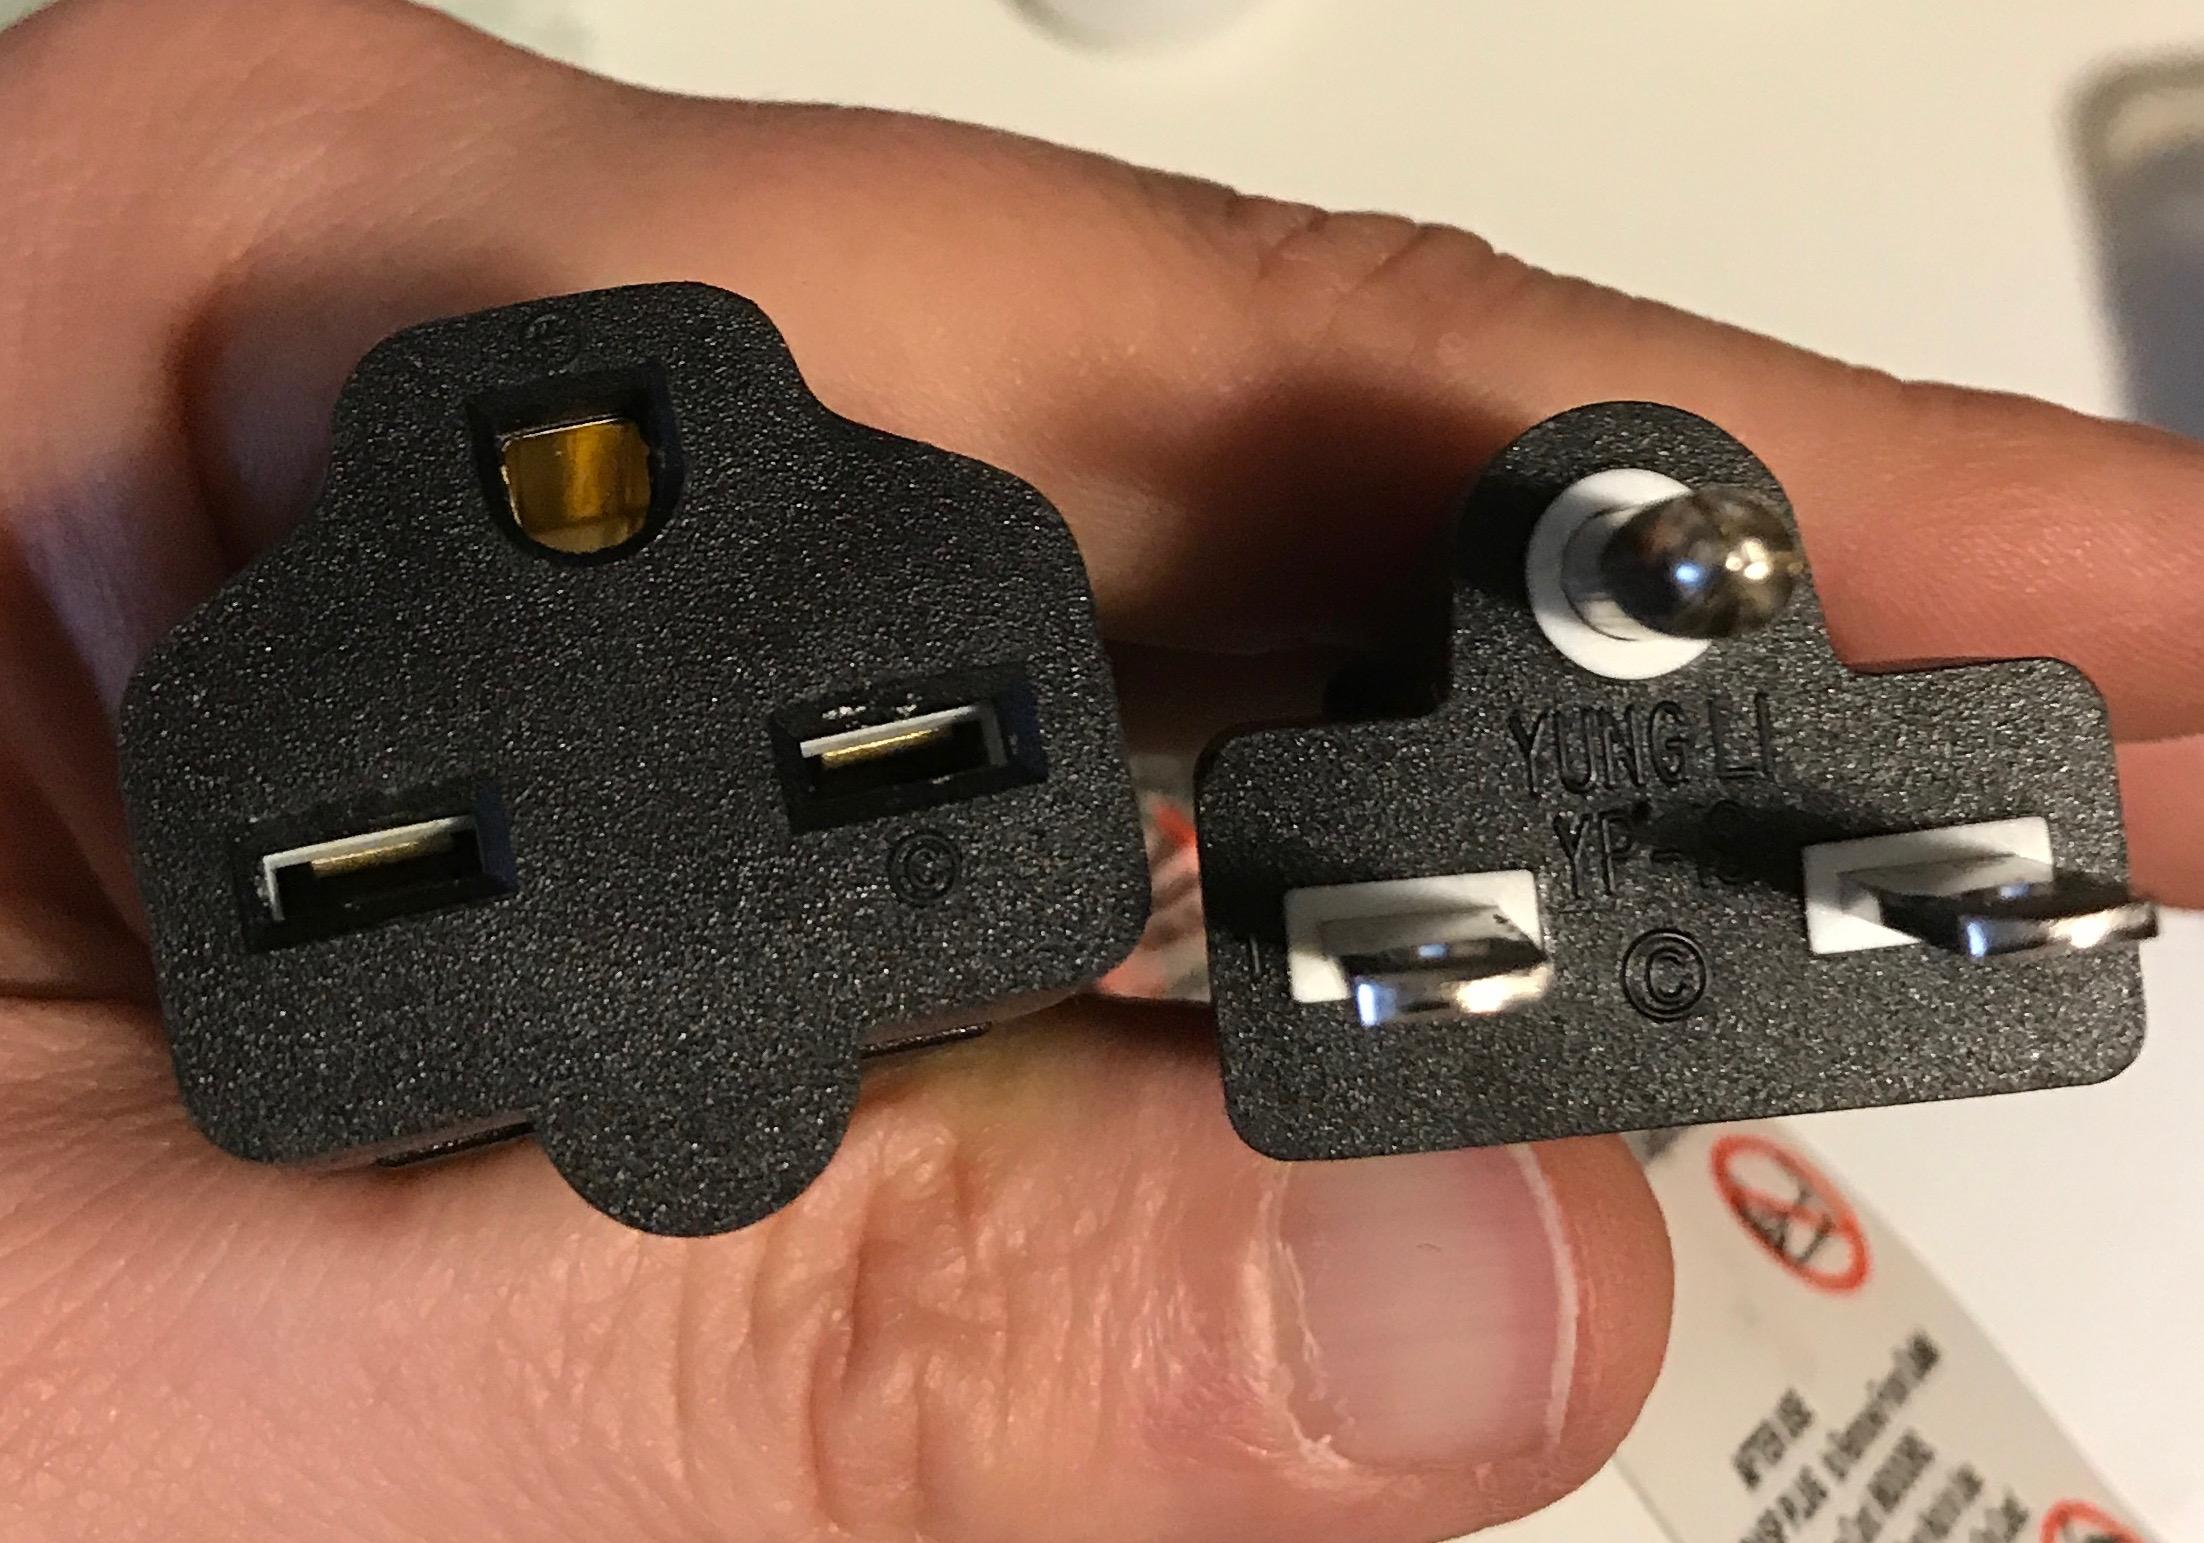 NEMA 6-15 extension cord